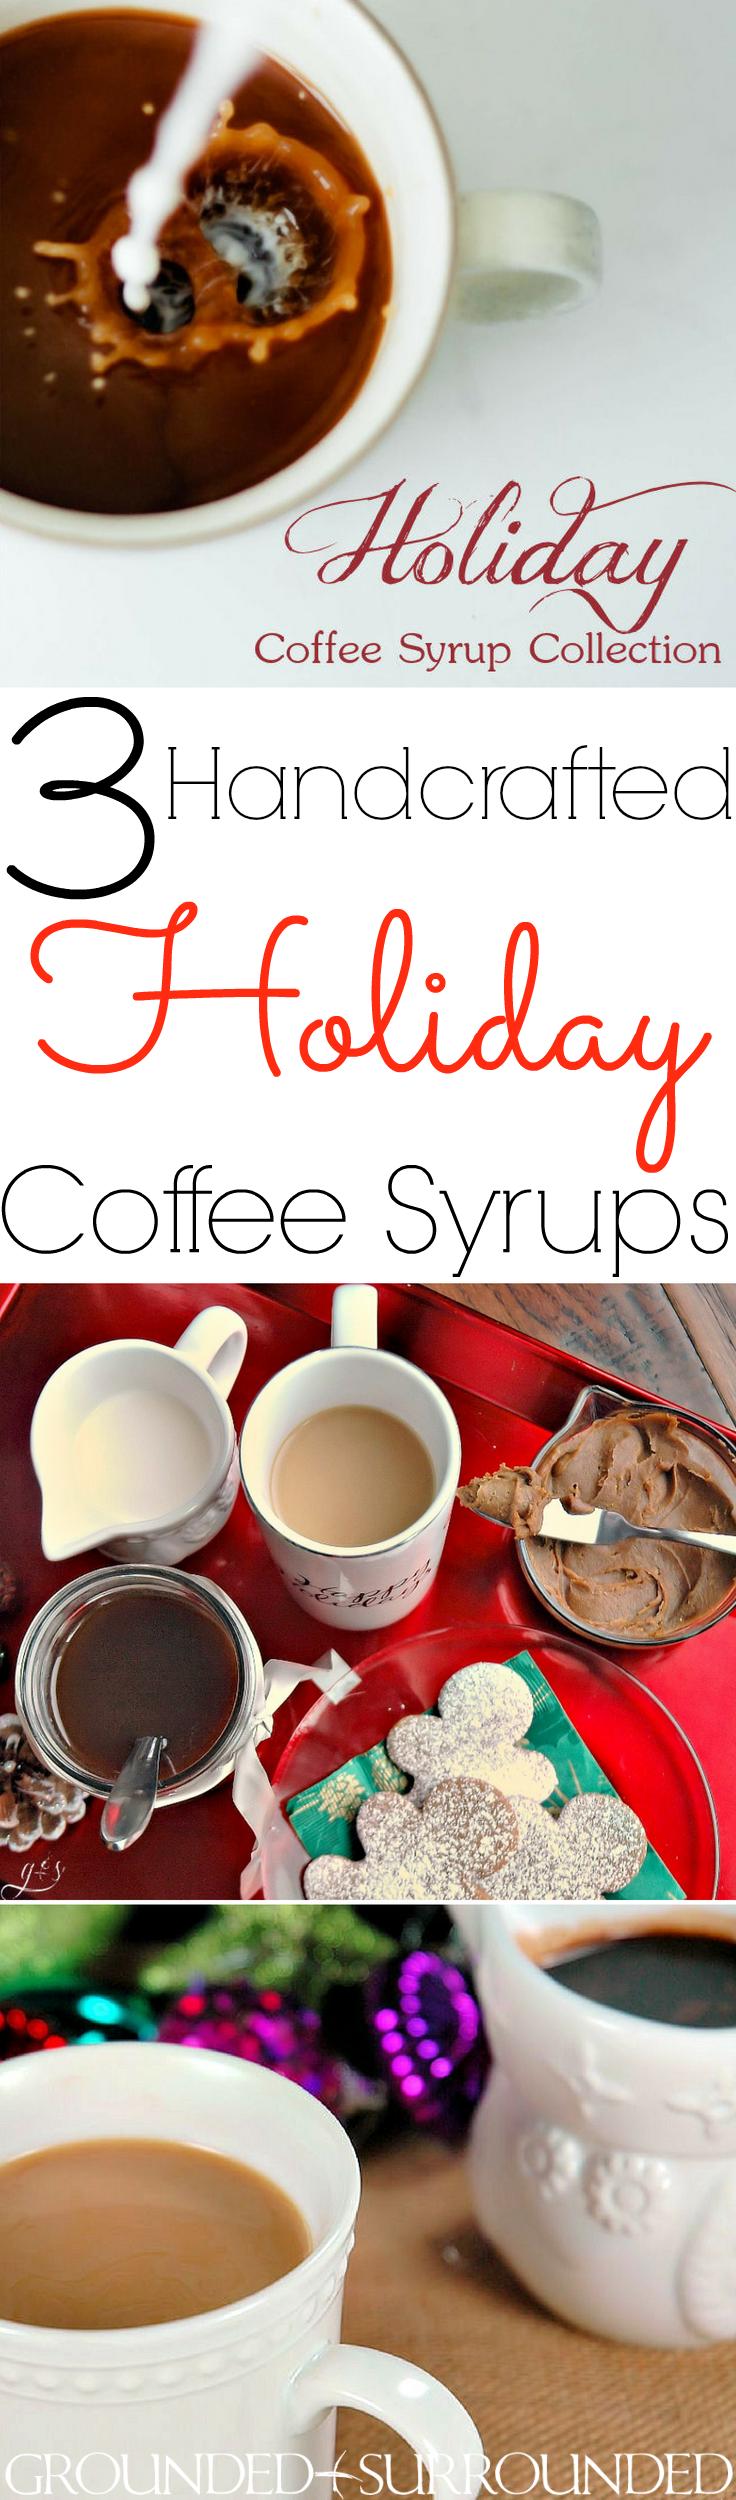 how to make starbucks mocha syrup